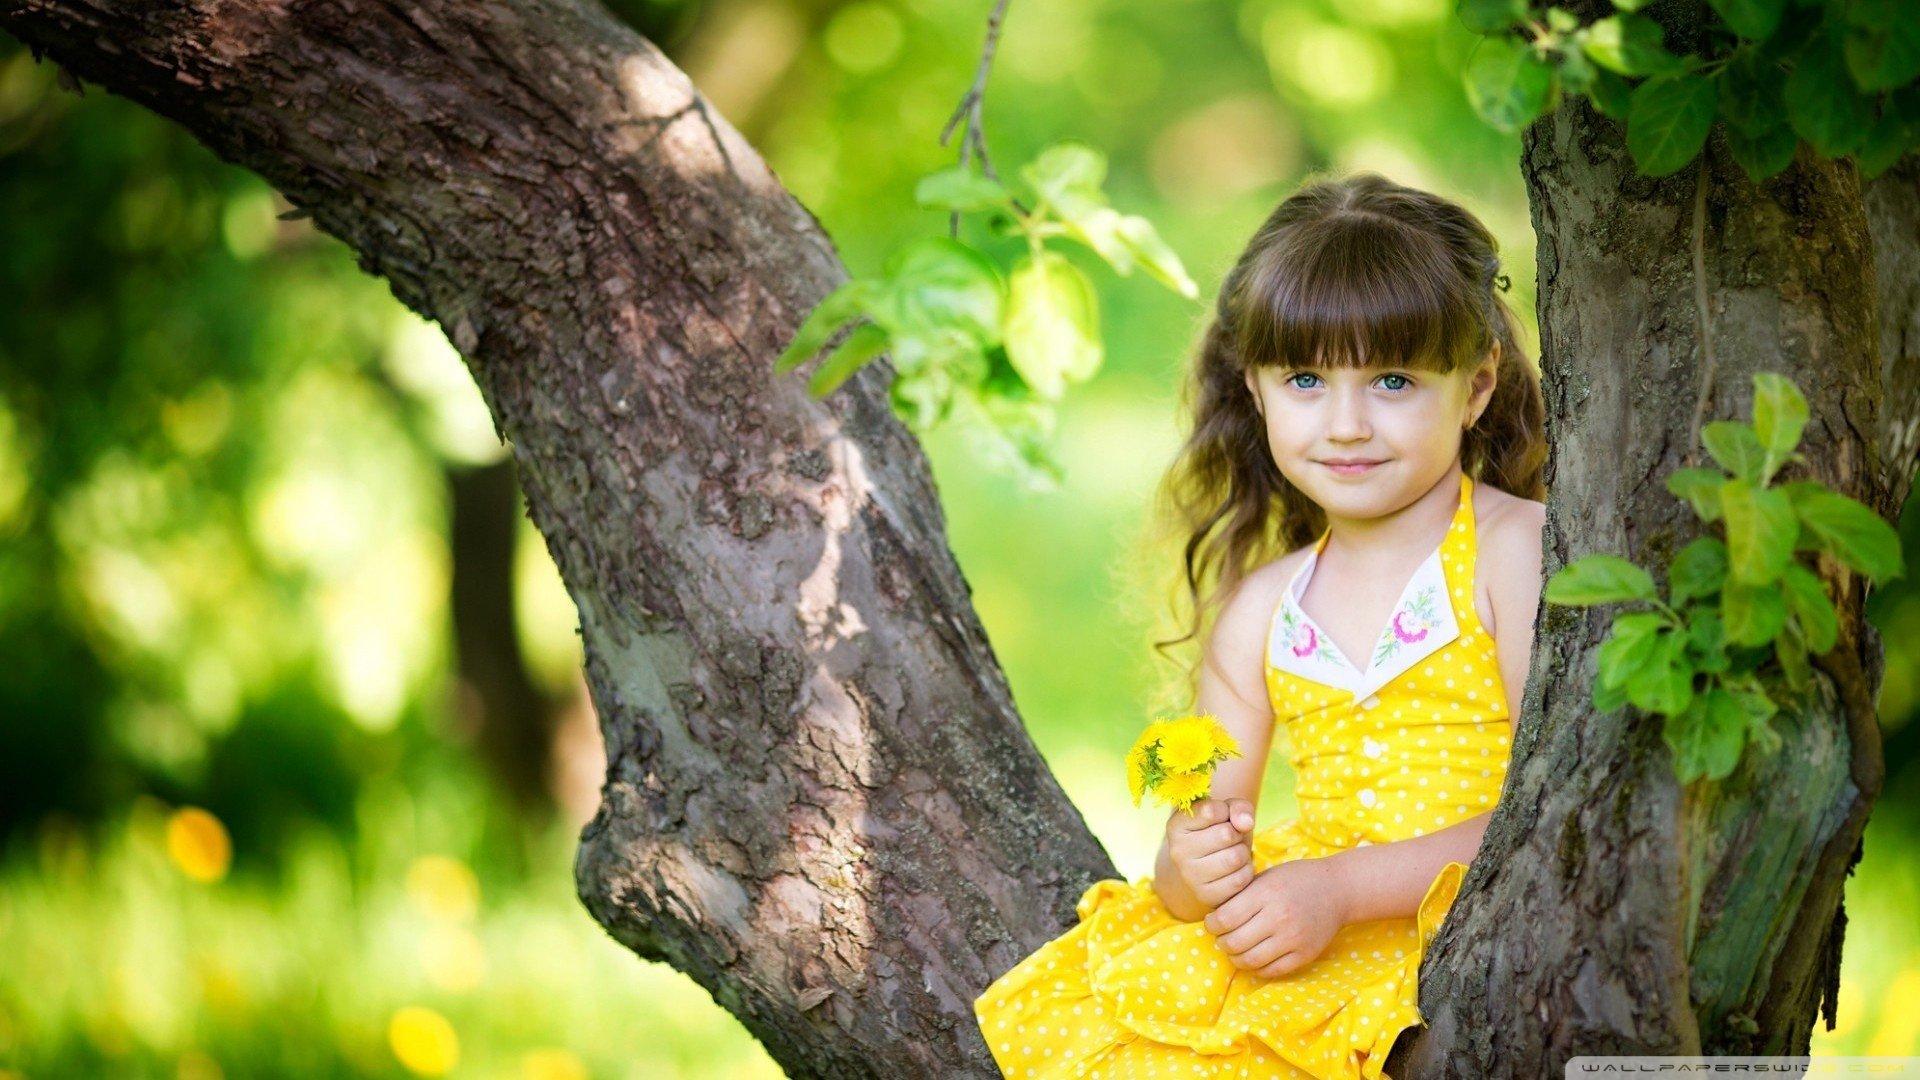 Cute Little Girl HD wallpaper